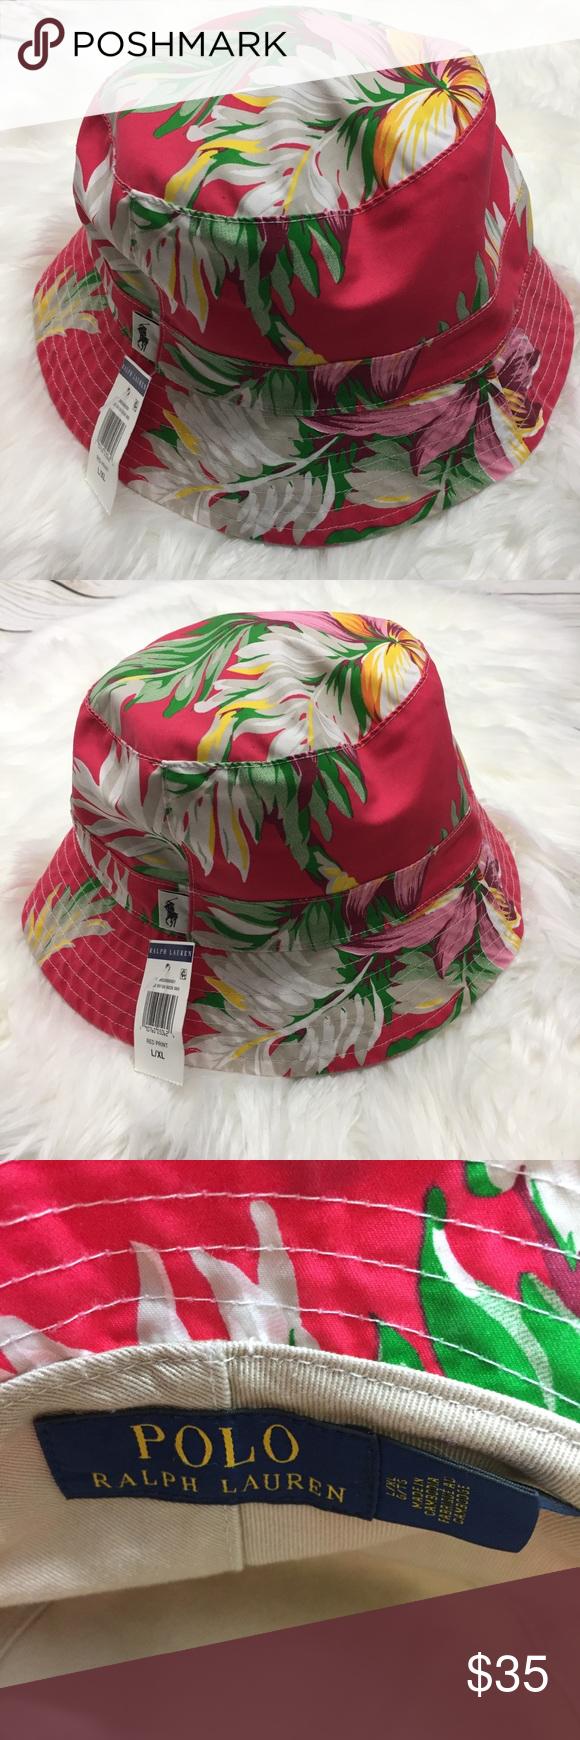 fdb40c72933 Polo Ralph Lauren Floral Palm Leaf Bucket Hat NEW! NWT Polo Ralph Lauren  Floral Palm